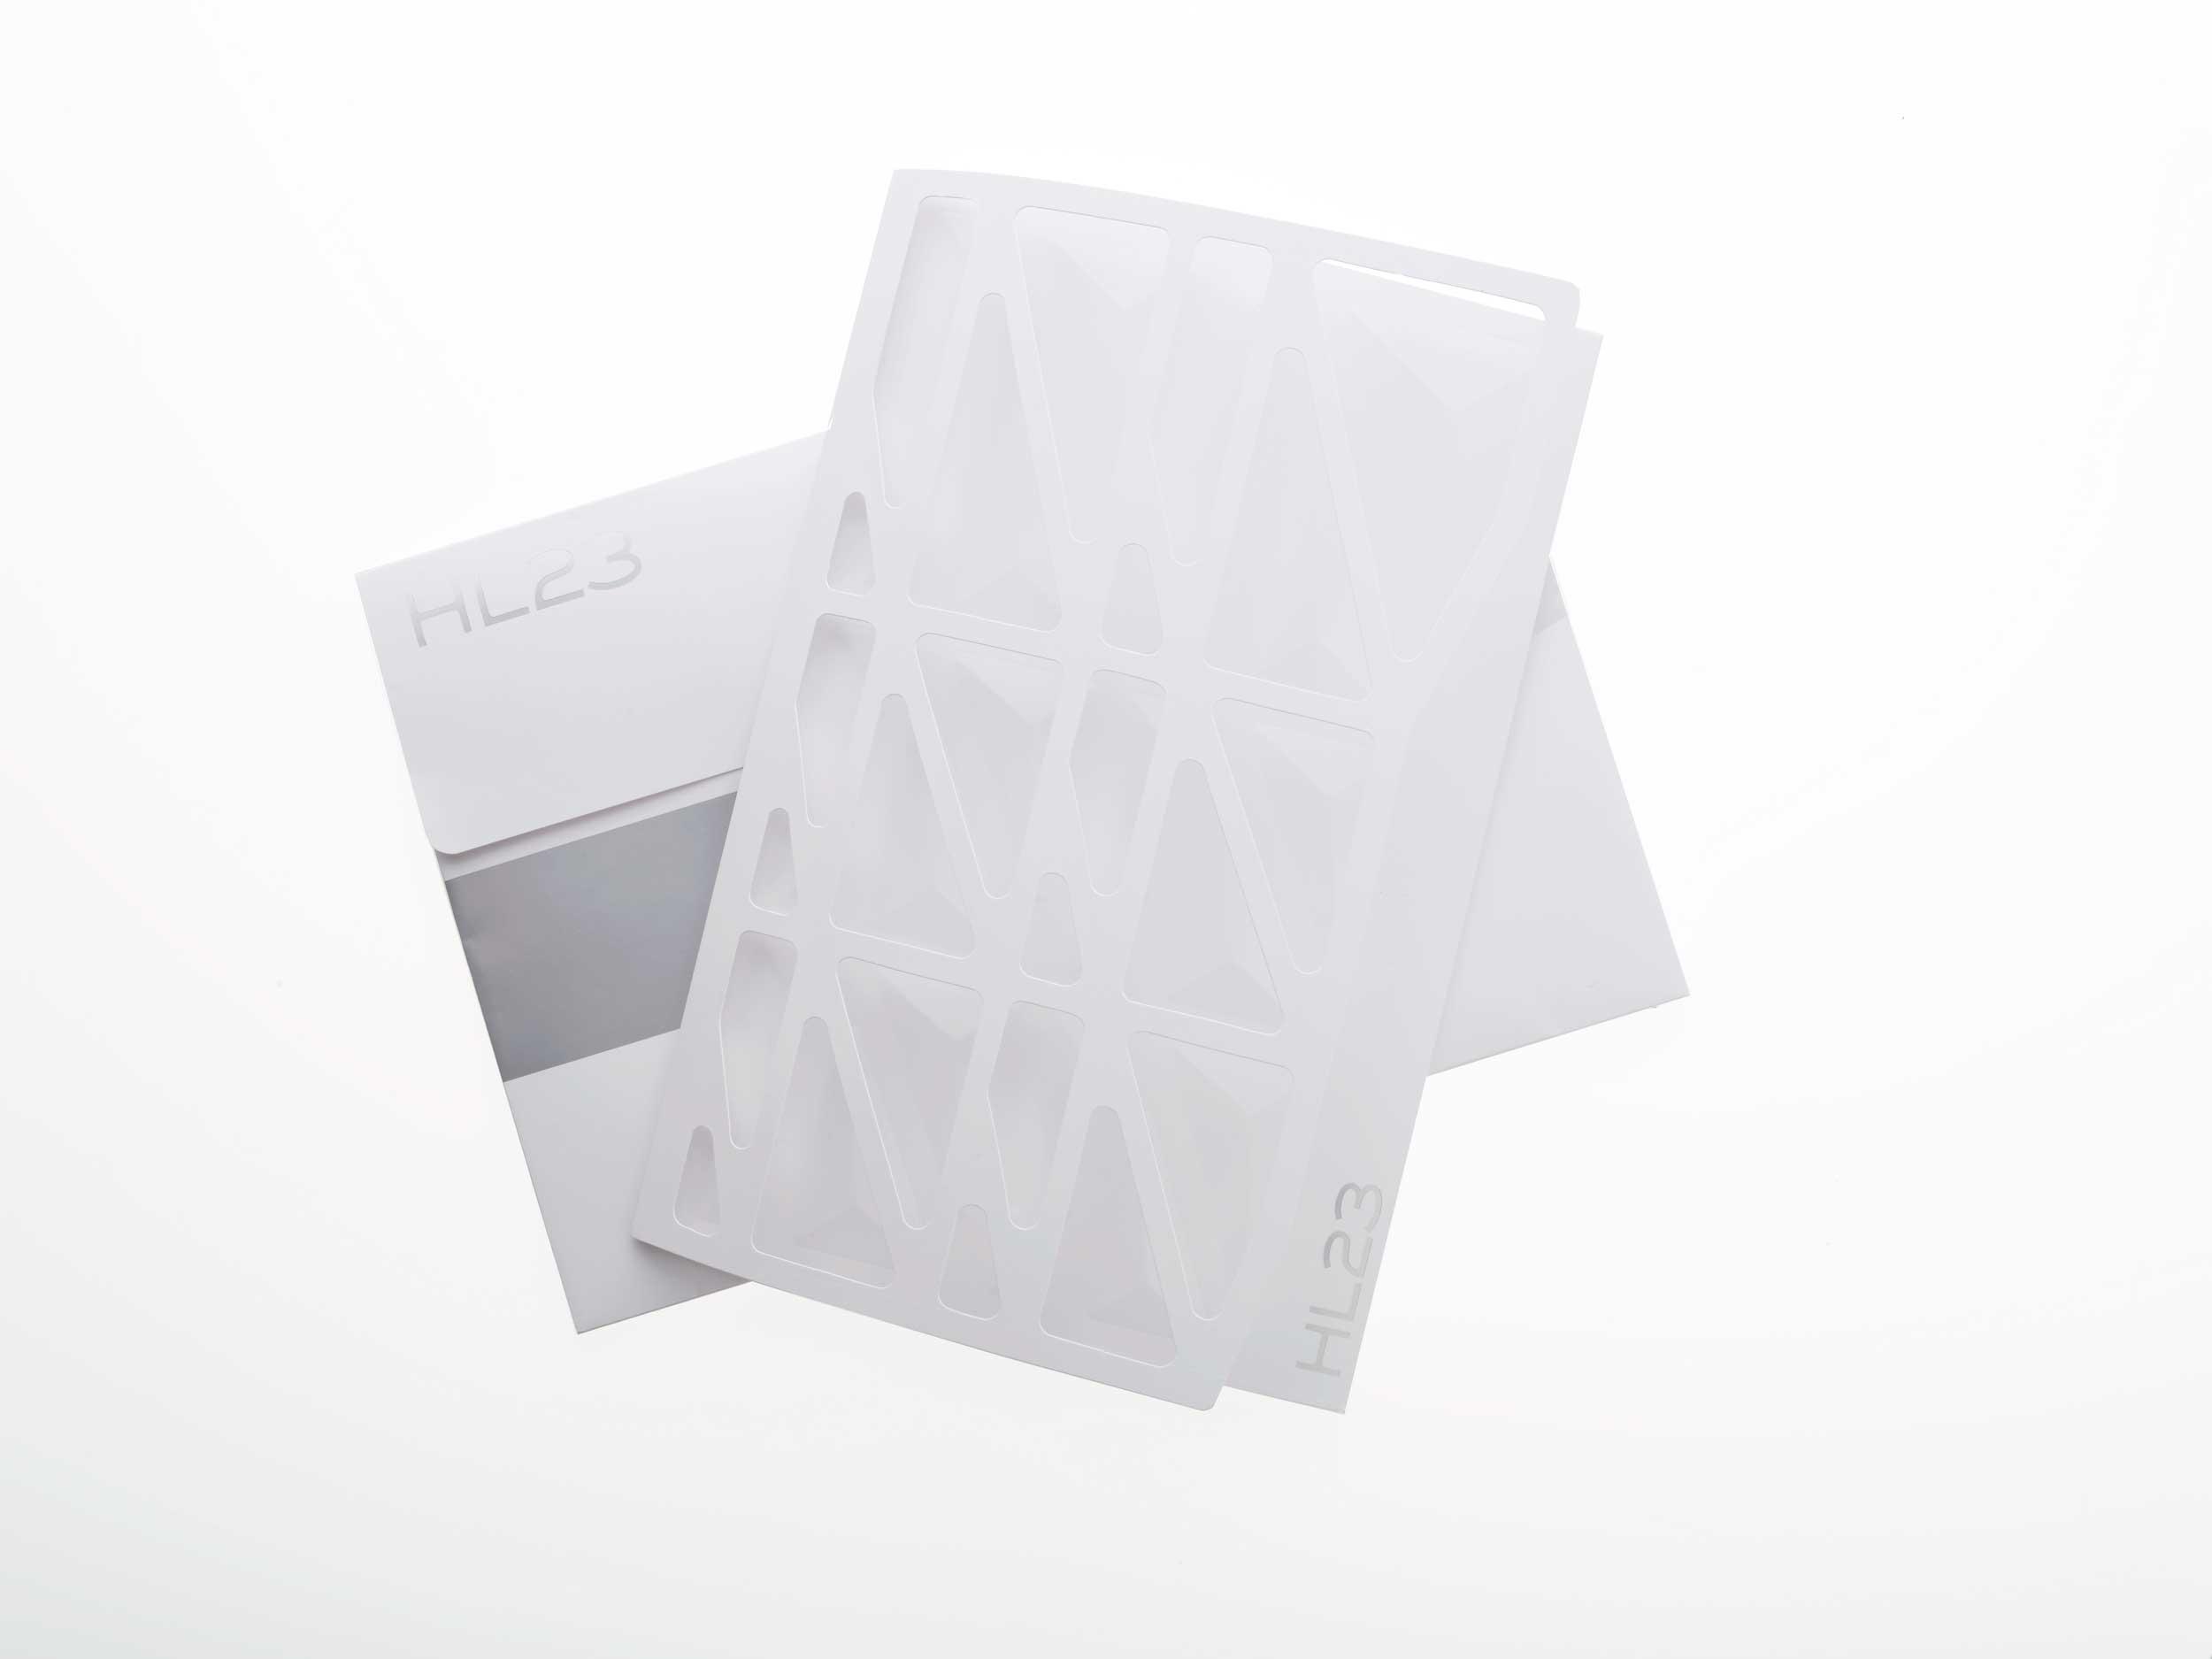 hl23-folderclosed